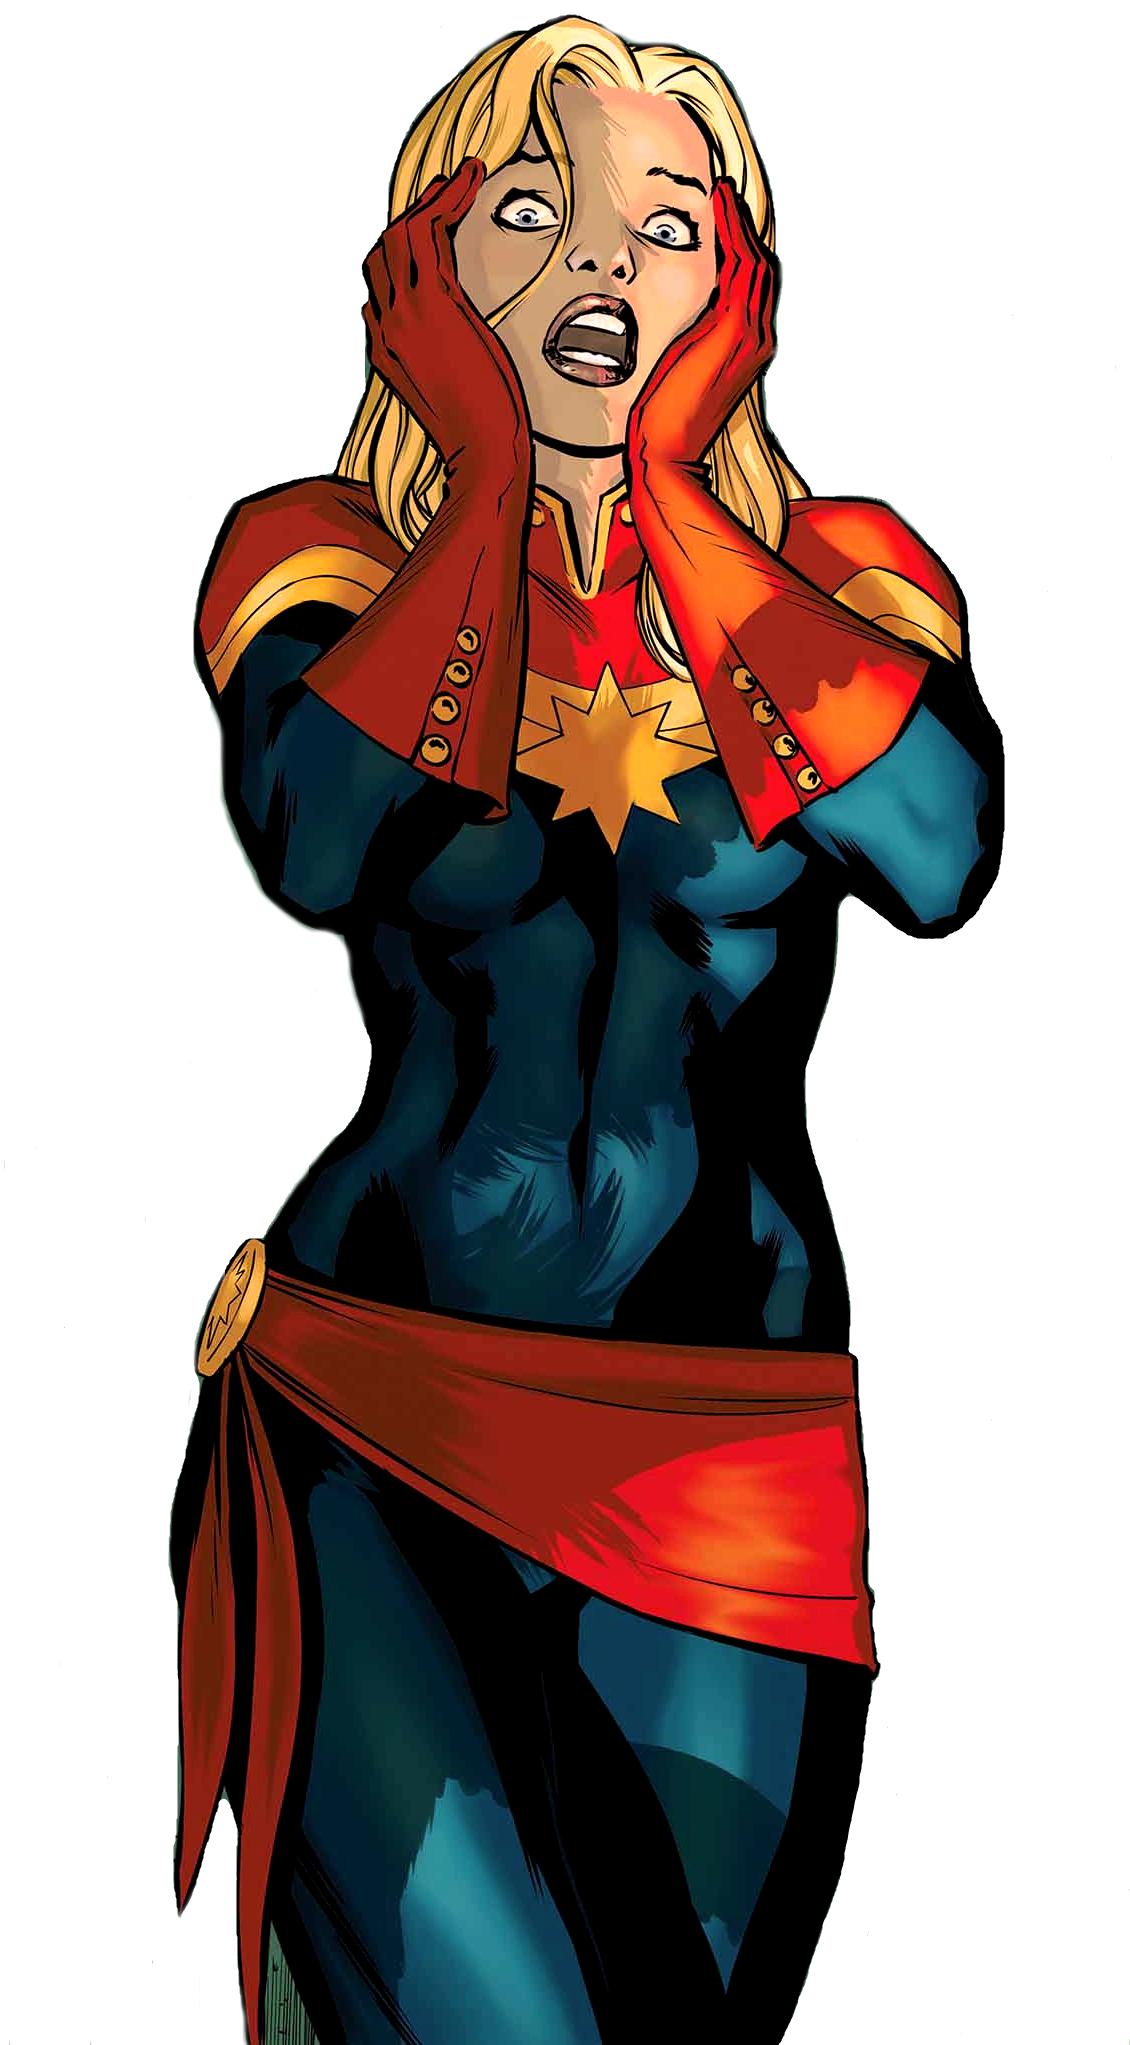 Costume Contest #121: Captain Marvel (Carol Danvers).